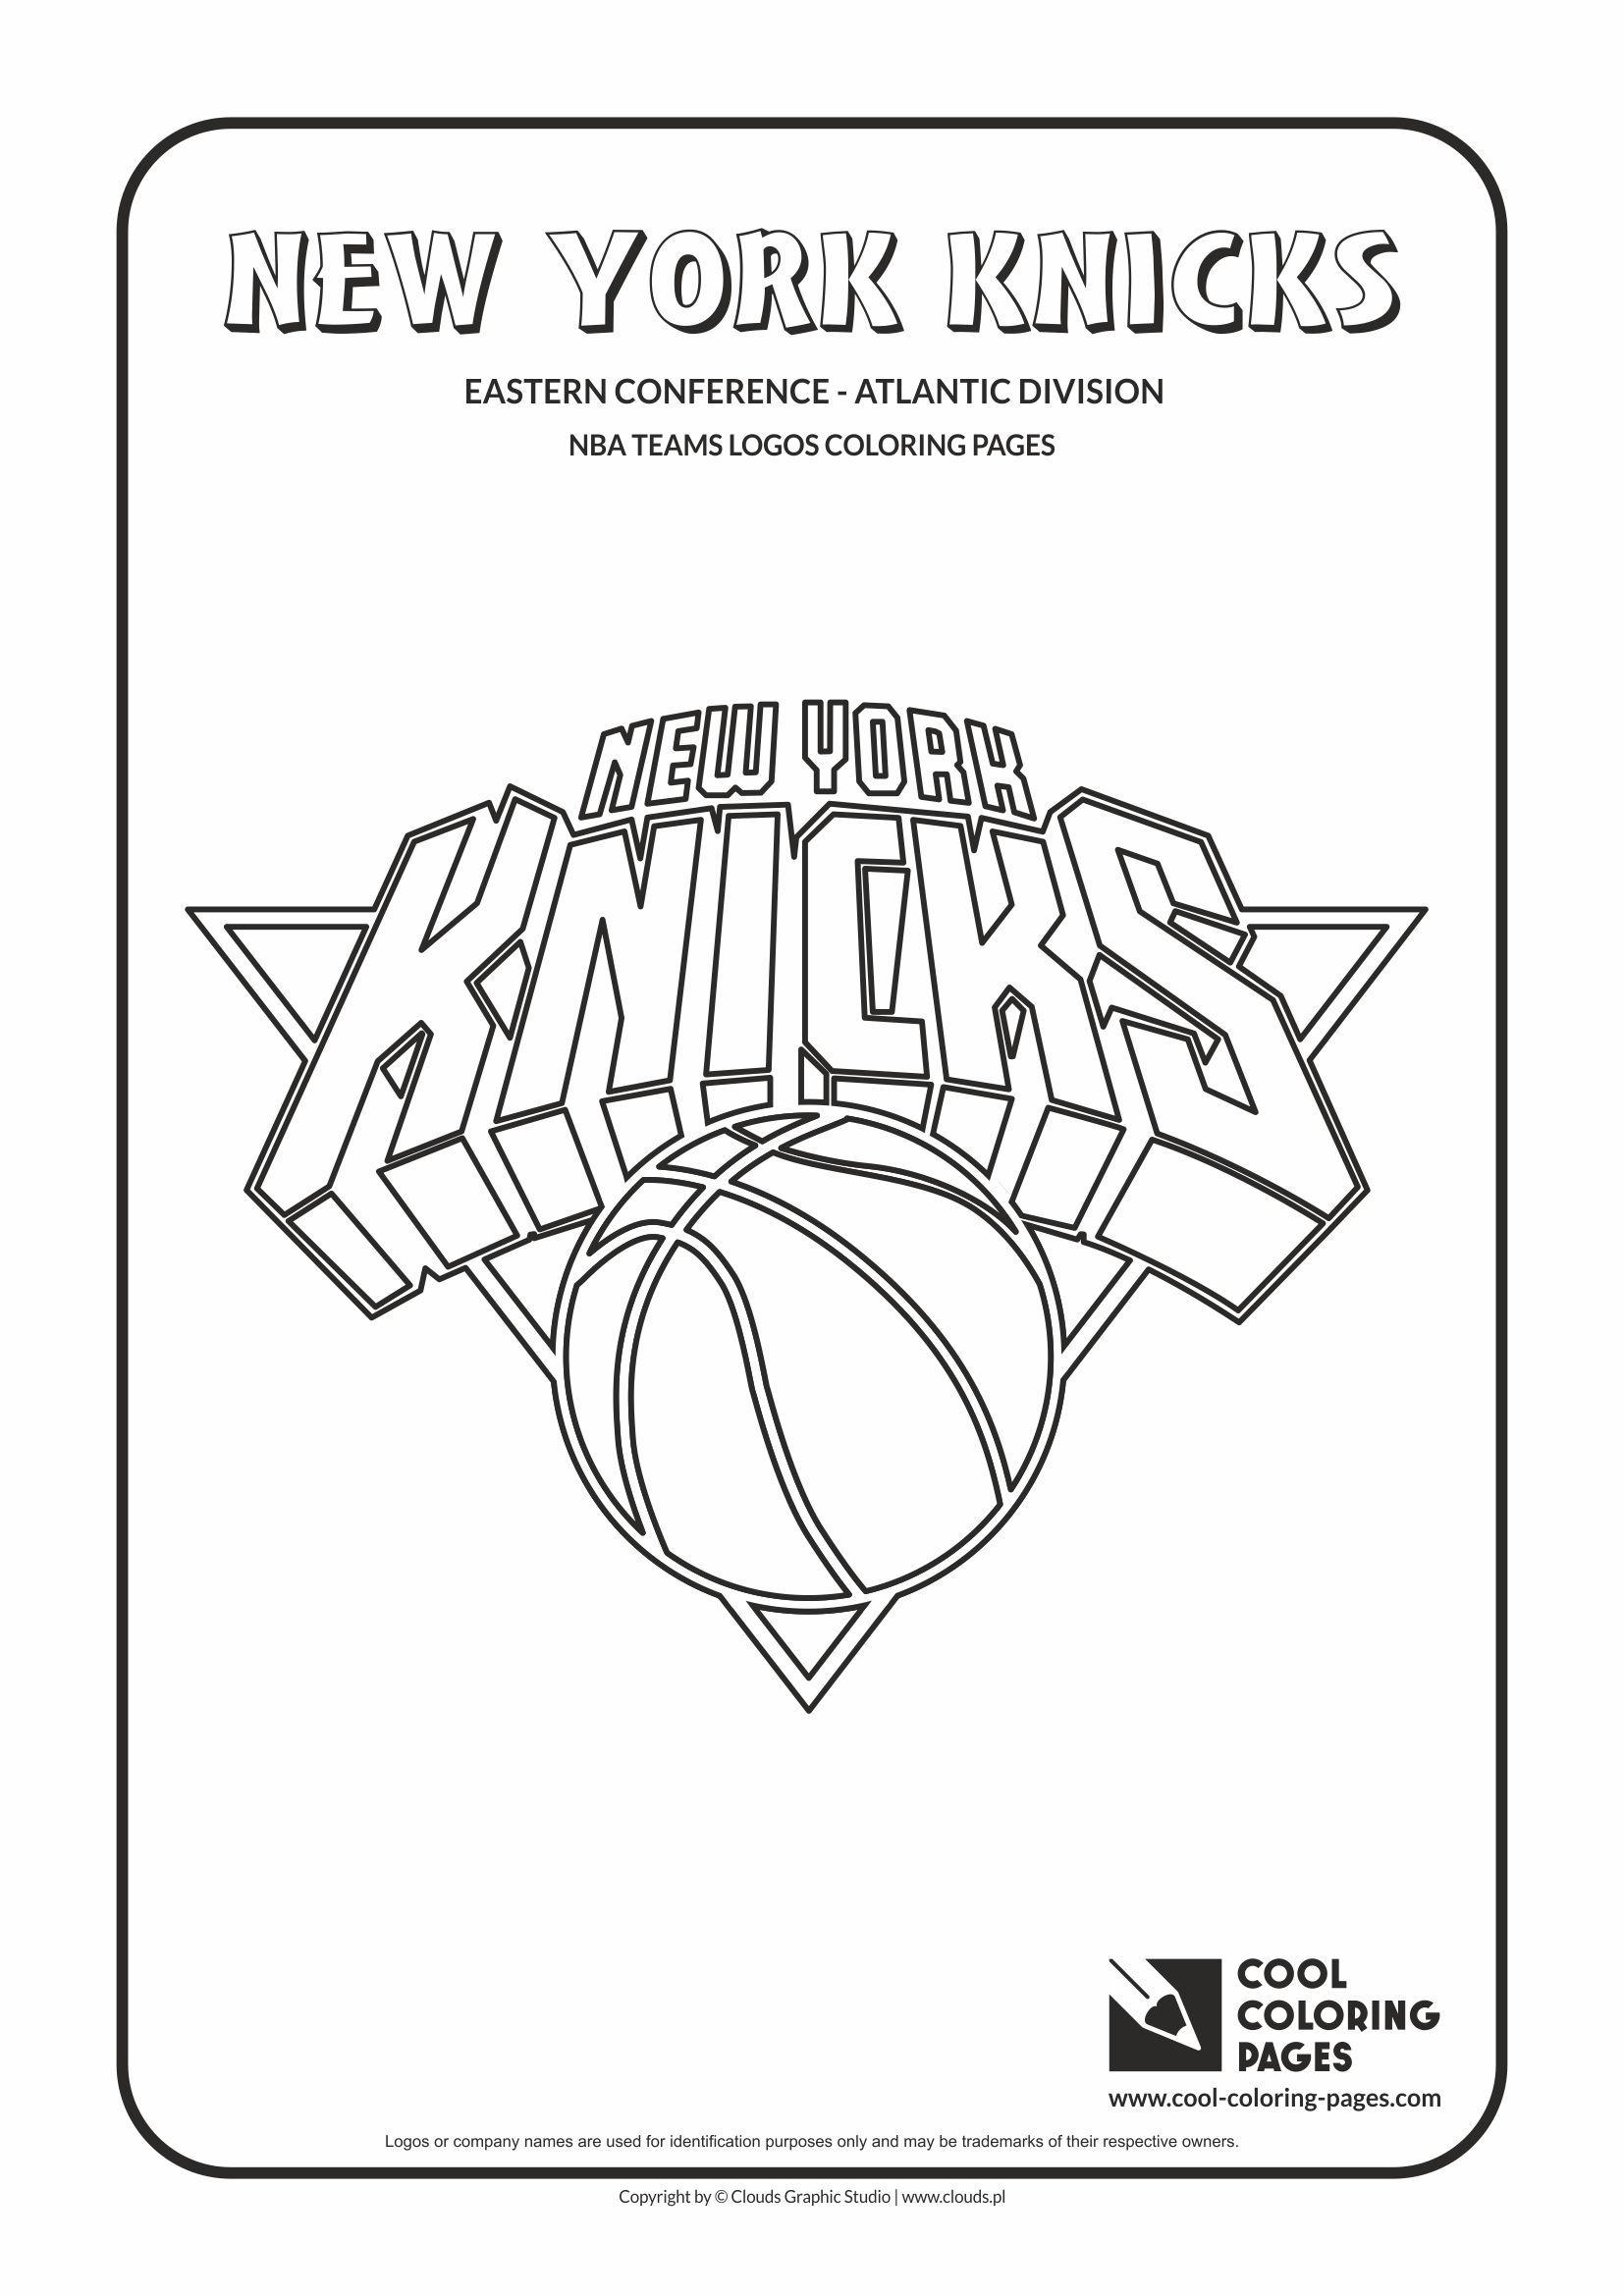 Cool Coloring Pages - NBA Teams Logos / New York Knicks ...